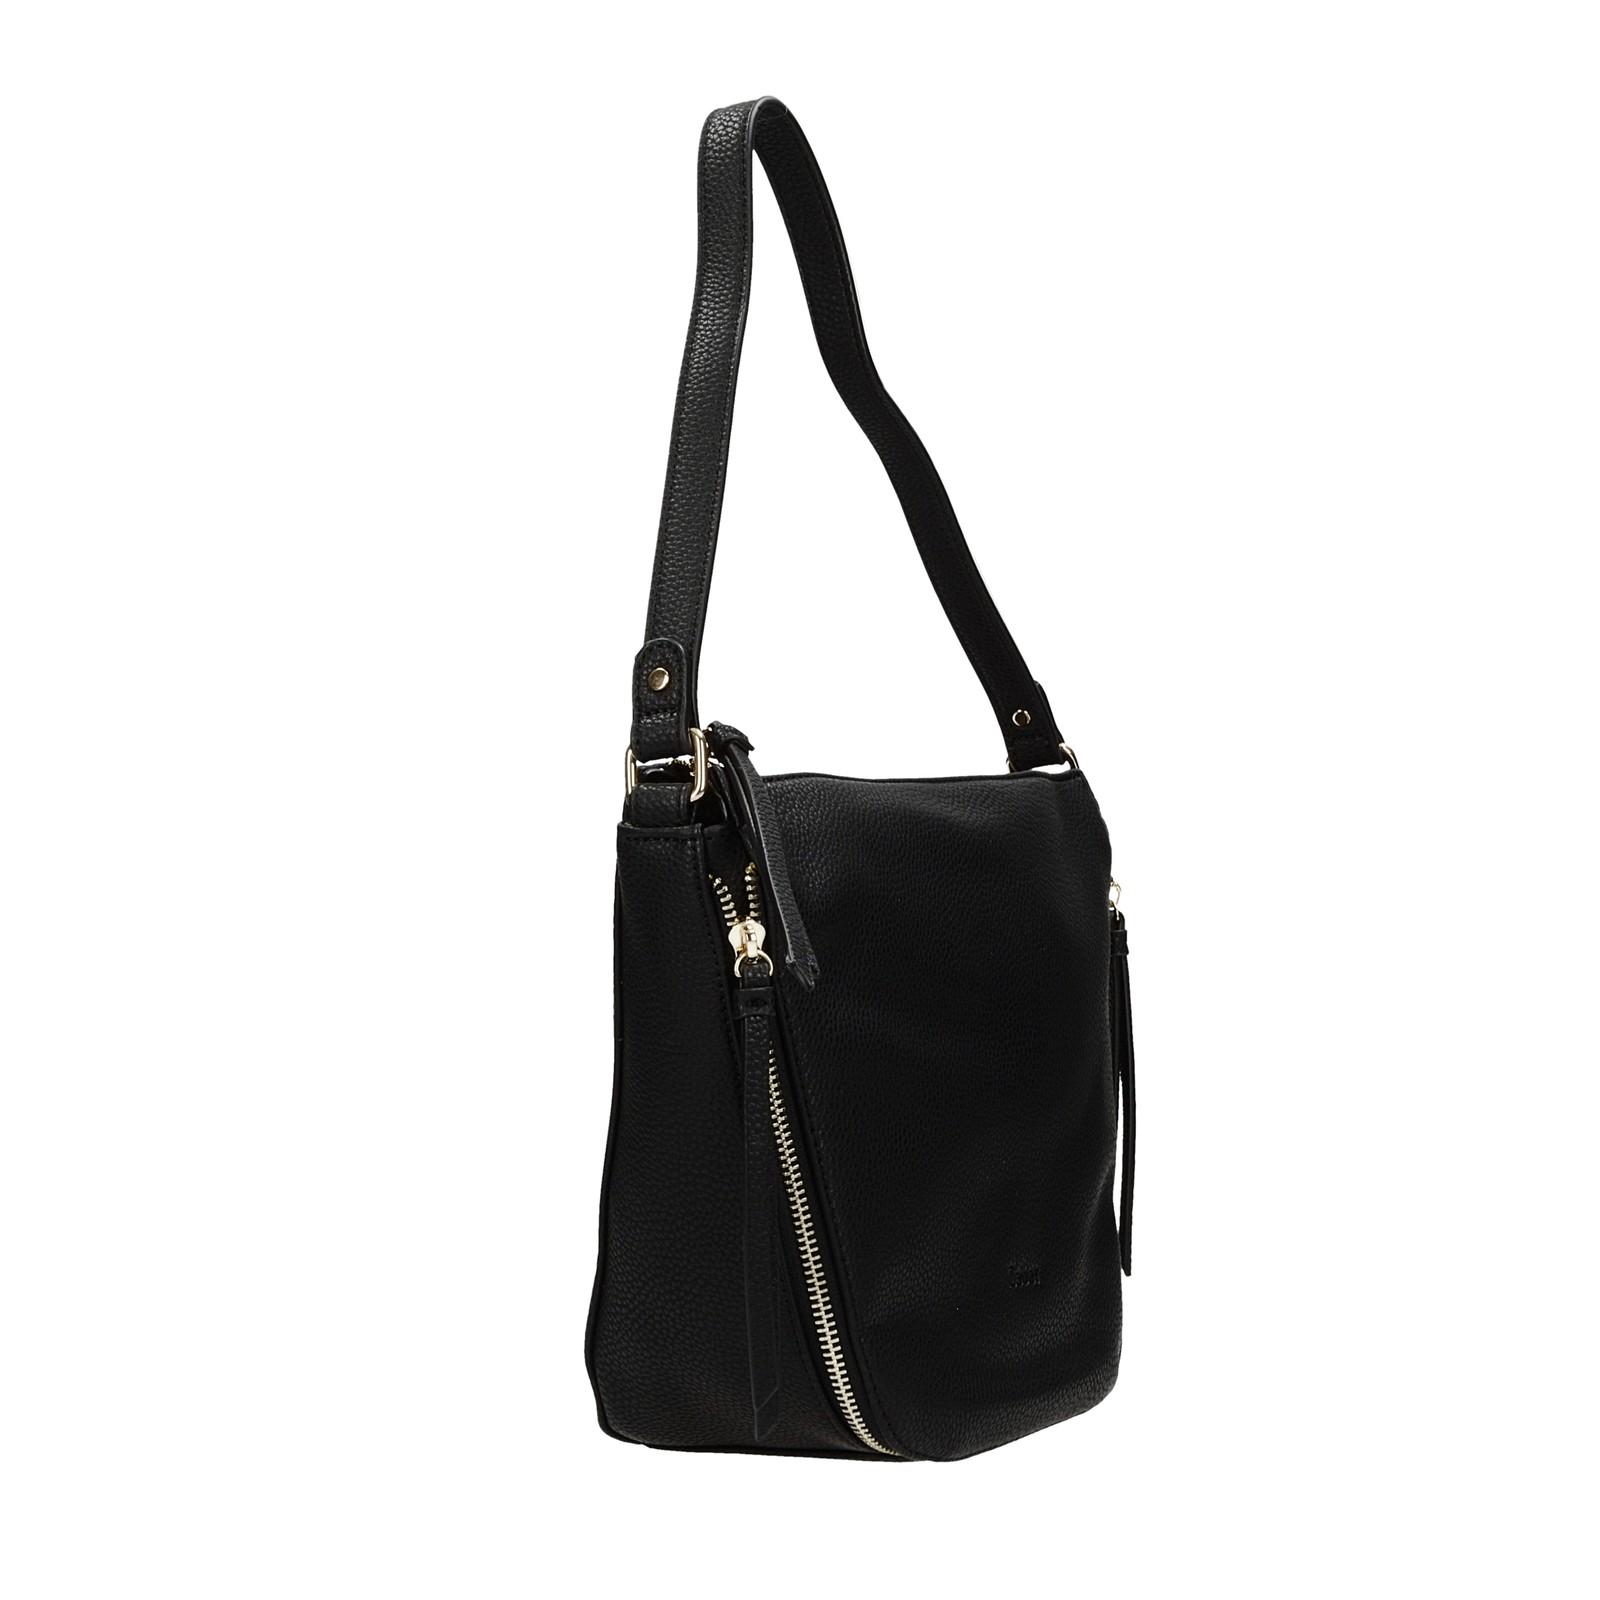 8ba51a441b ... Gabor dámska štýlová kabelka - čierna ...